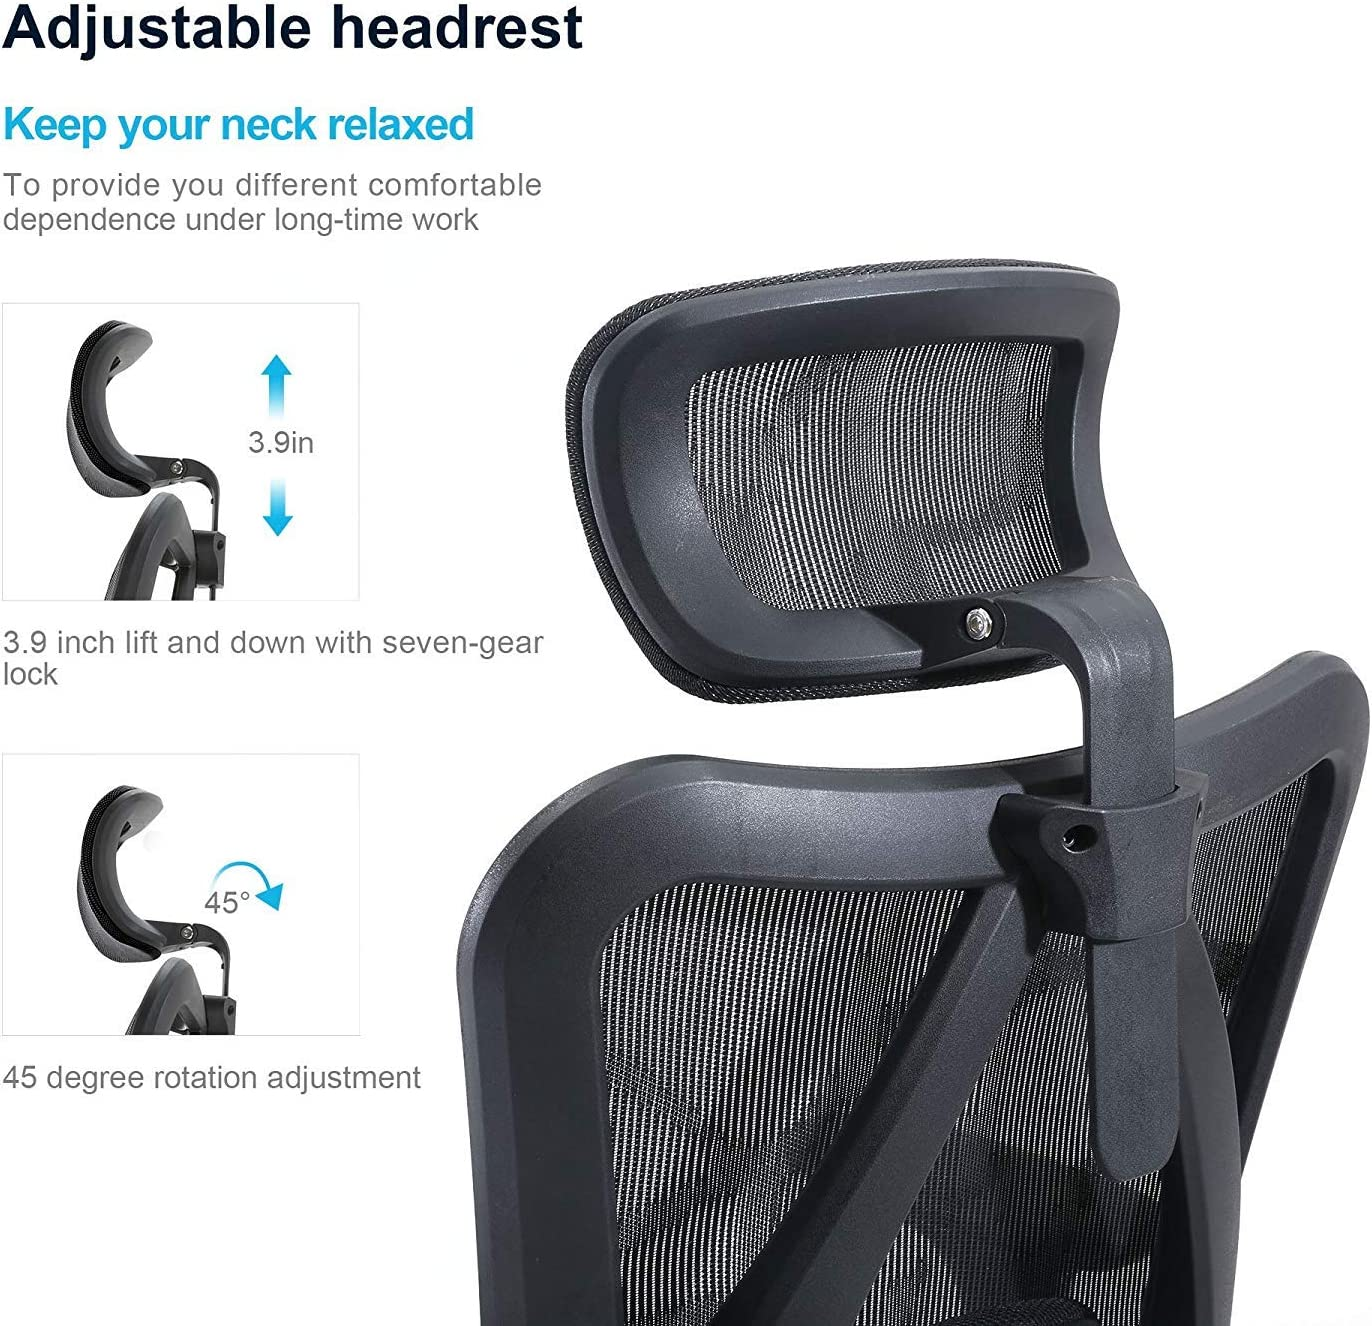 Black SIHOO Ergonomic Office Chair Adjustable Lumbar Support 3D Armrests Skin-Friendly Mesh Desk Chair High Back